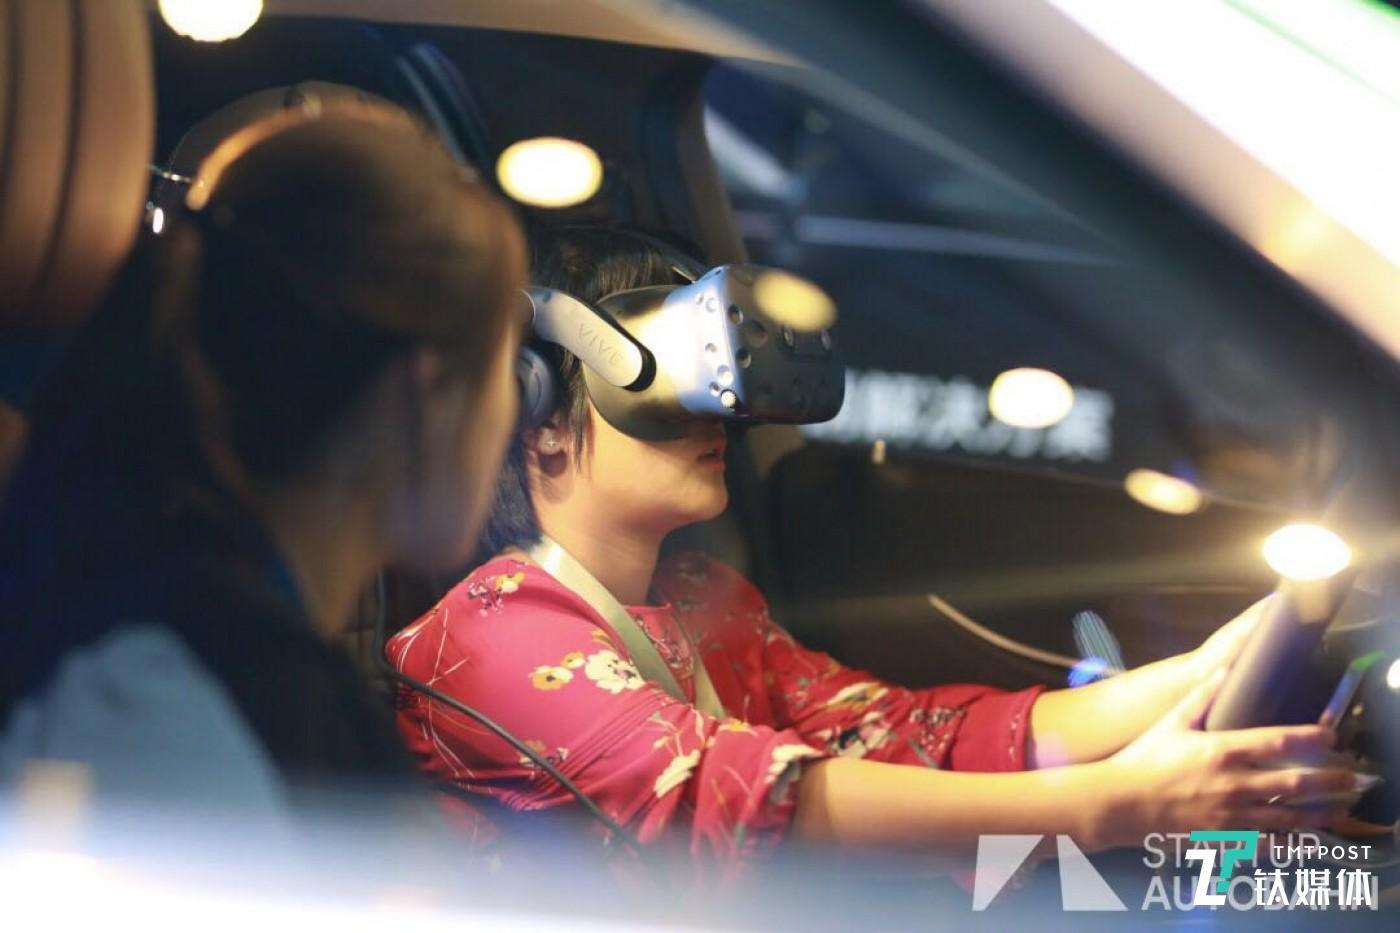 51VR,虚拟现实技术体验驾驶功能。